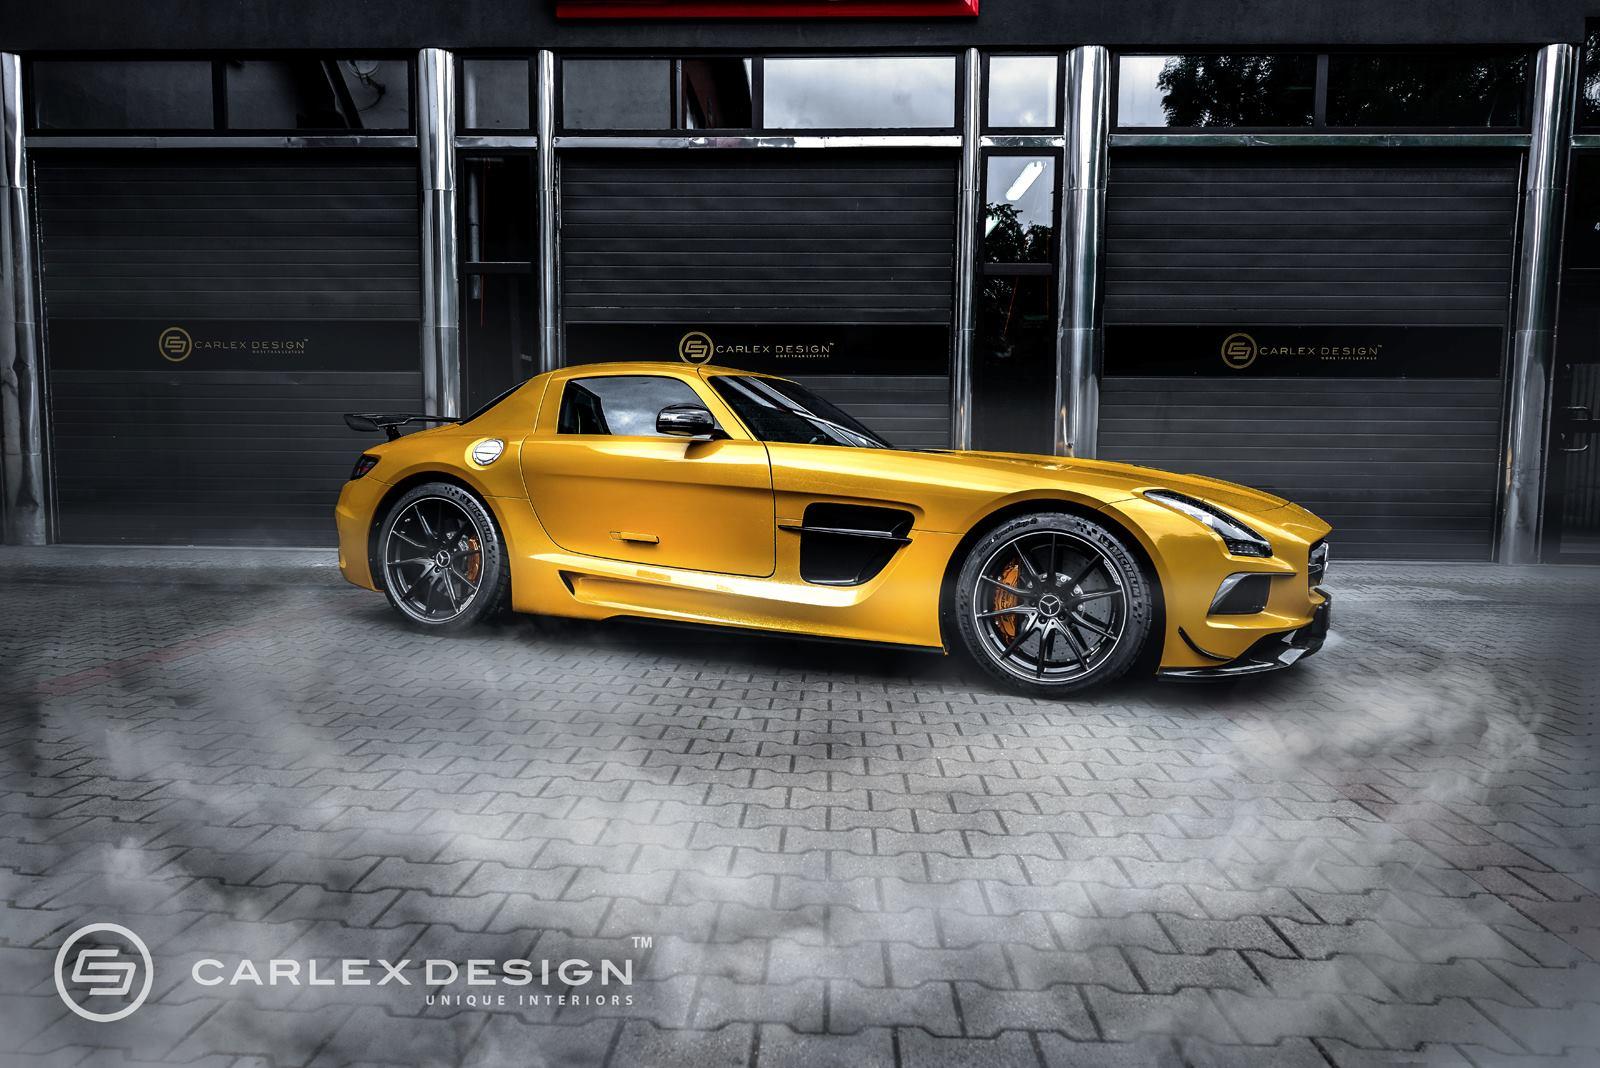 Official: Mercedes-Benz SLS AMG Black Series by Carlex Design